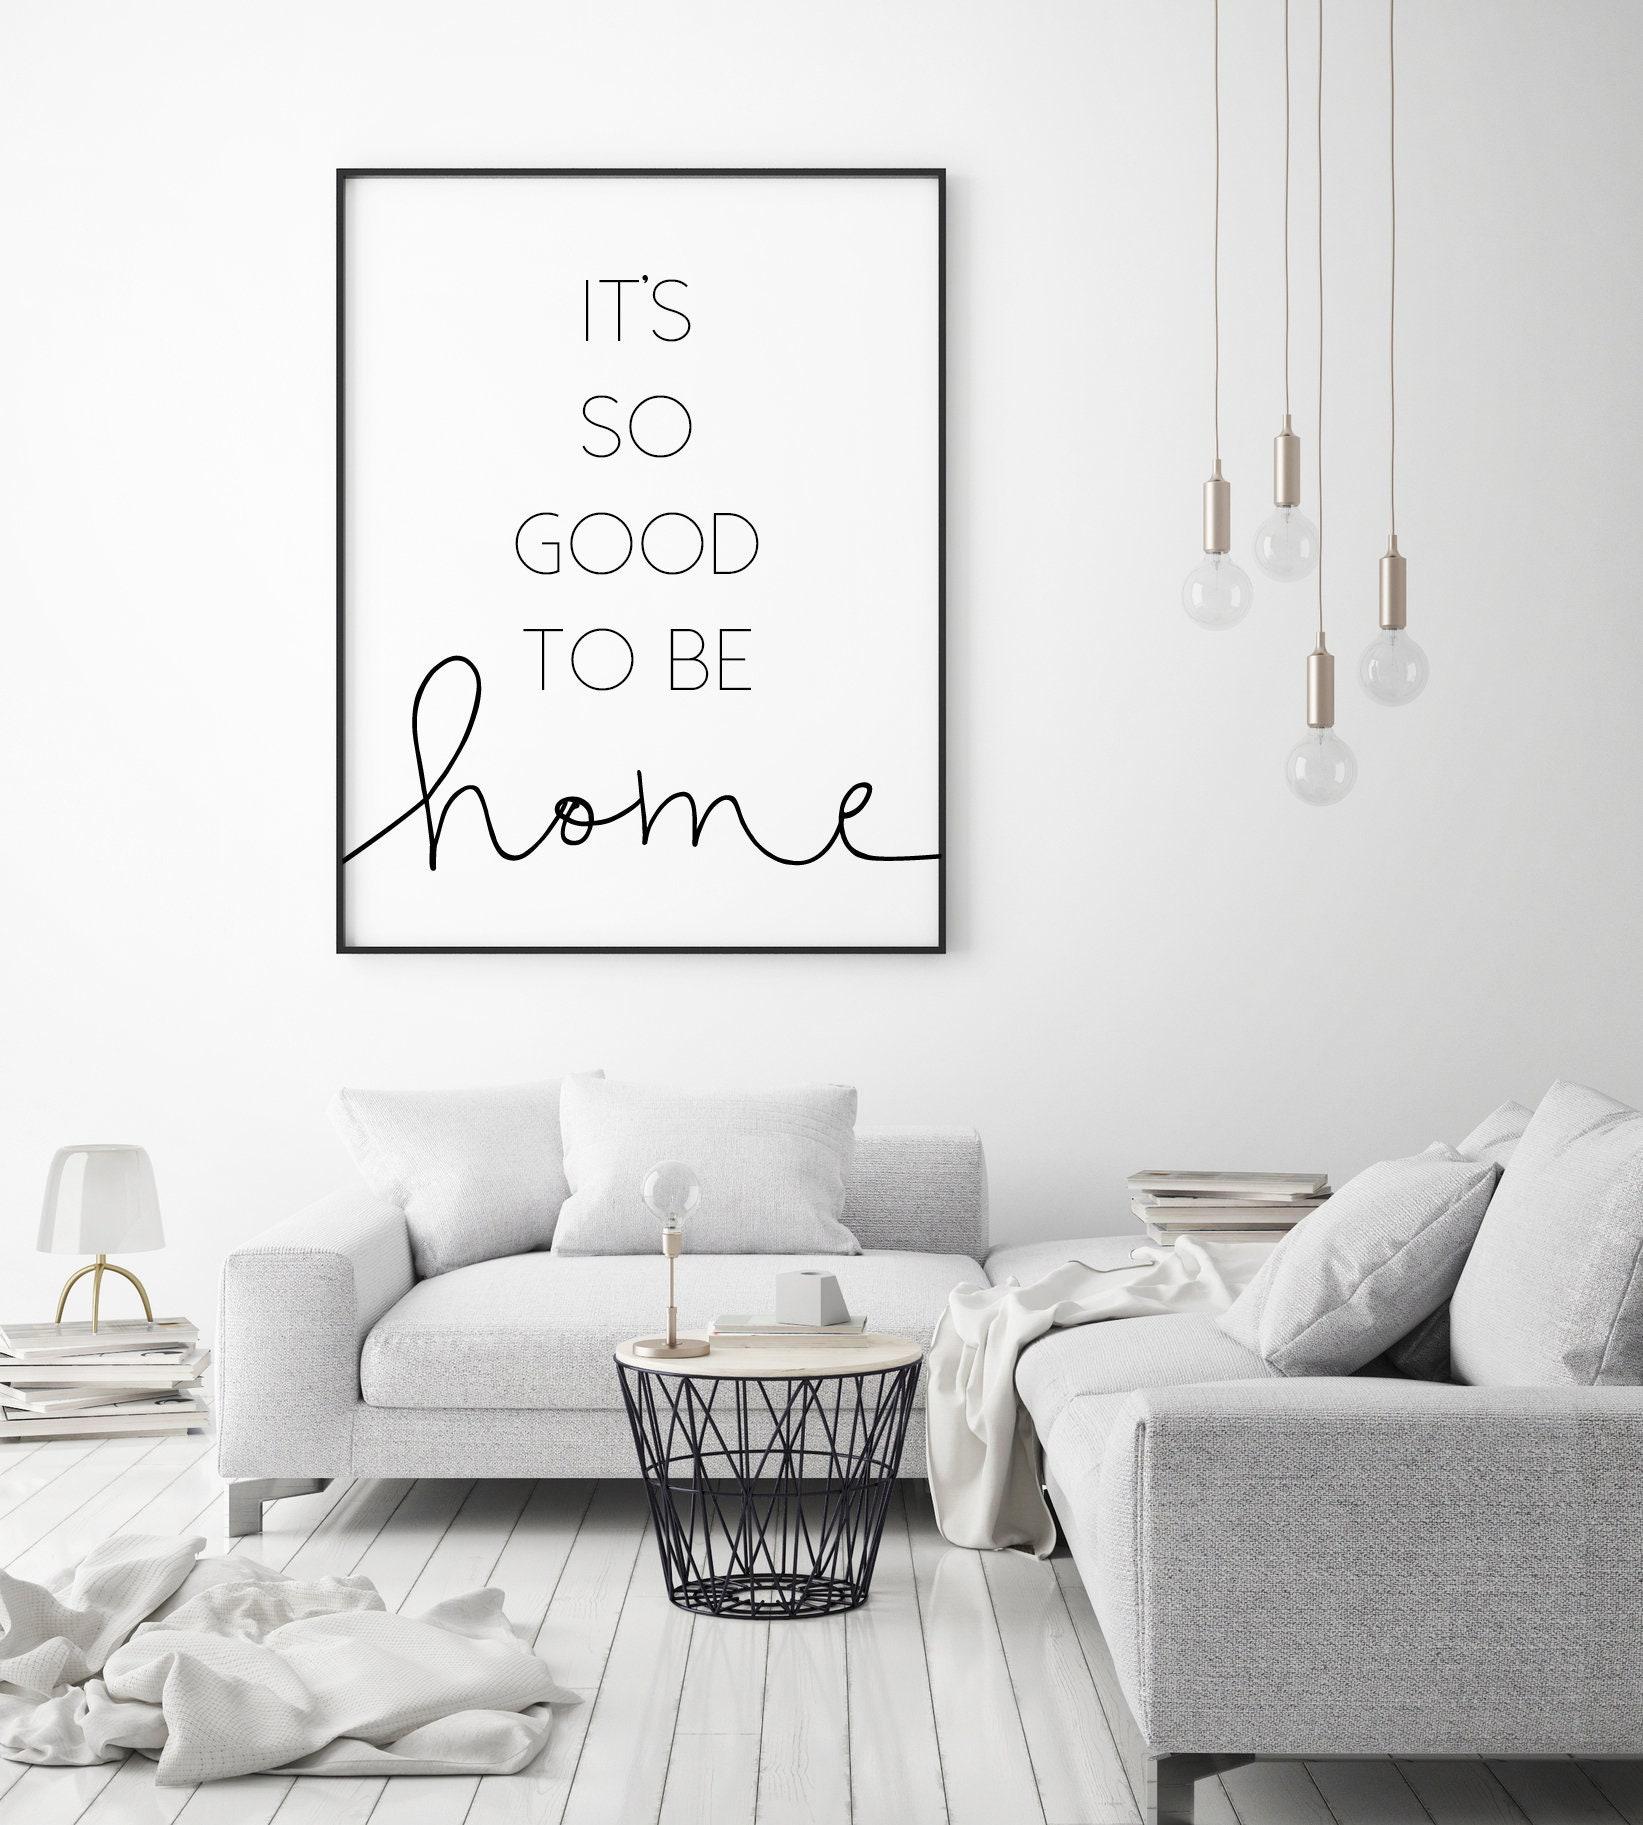 Its So Good To Be Home 24x36 16x20 11x14 8x10 5x7 Wall Decor